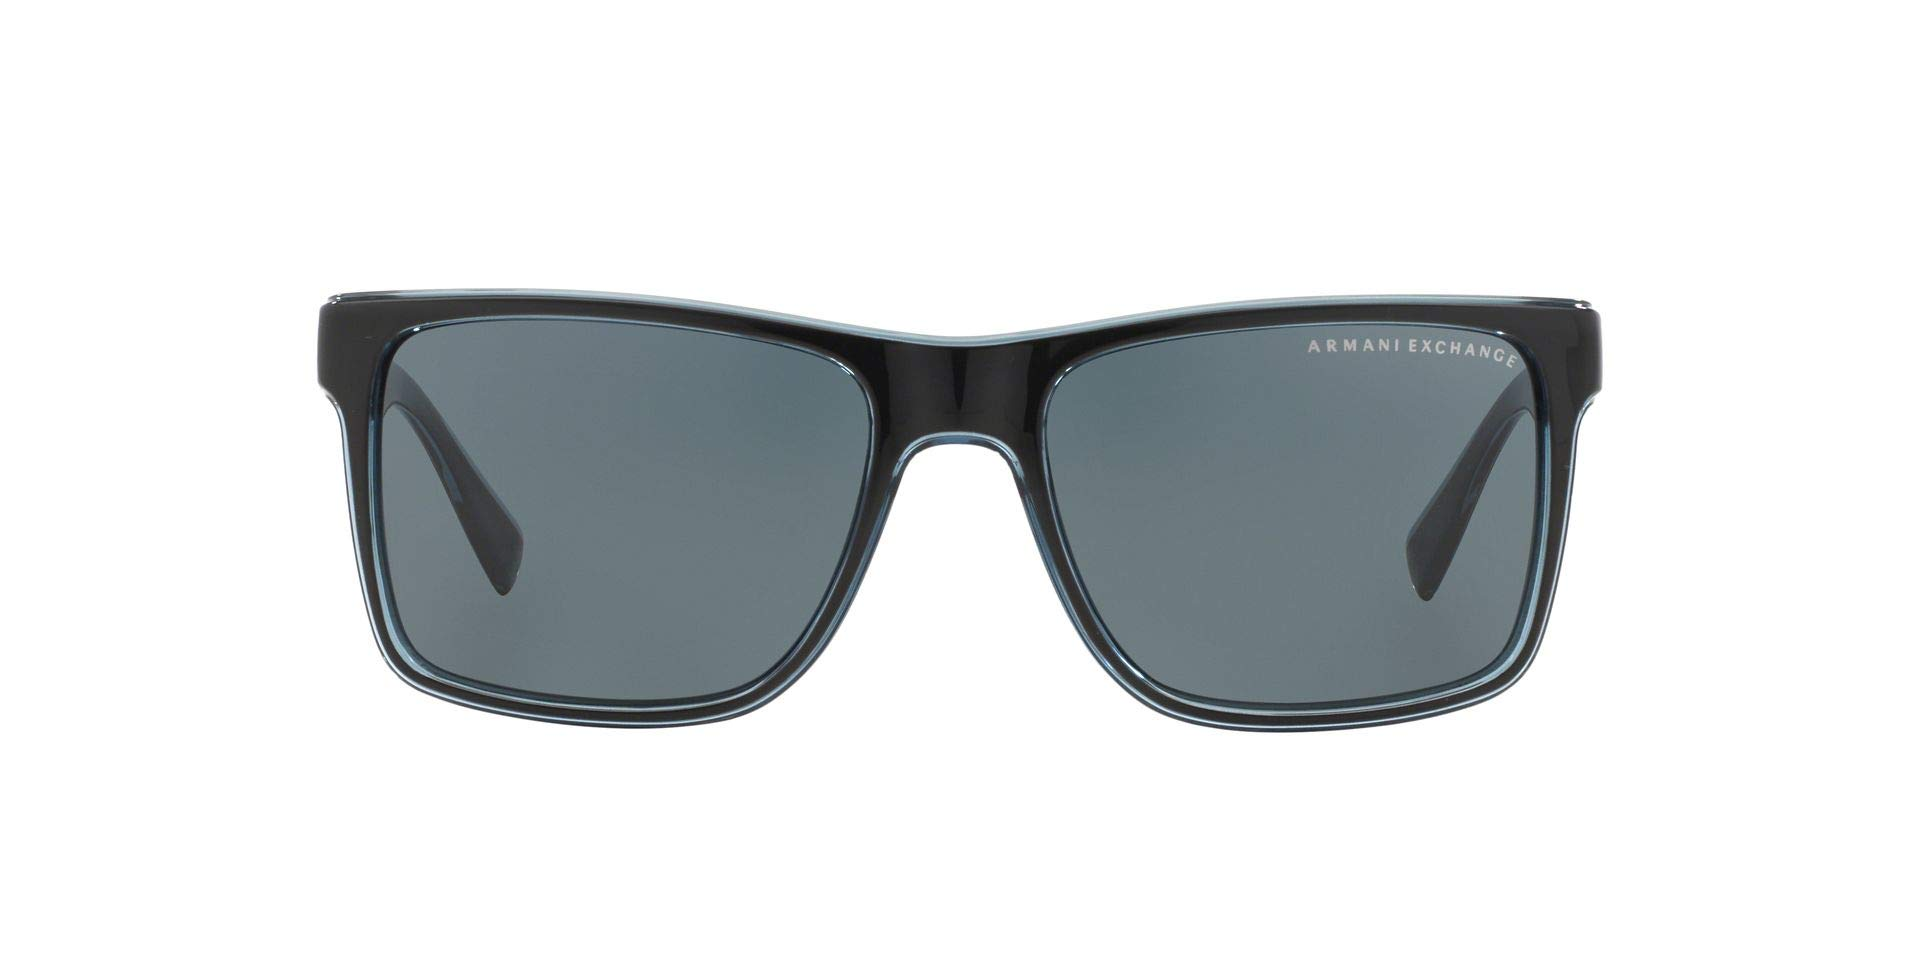 Sunglasses Exchange Armani AX 4016 805187 BLACK/TRANSP. BLUE GREY